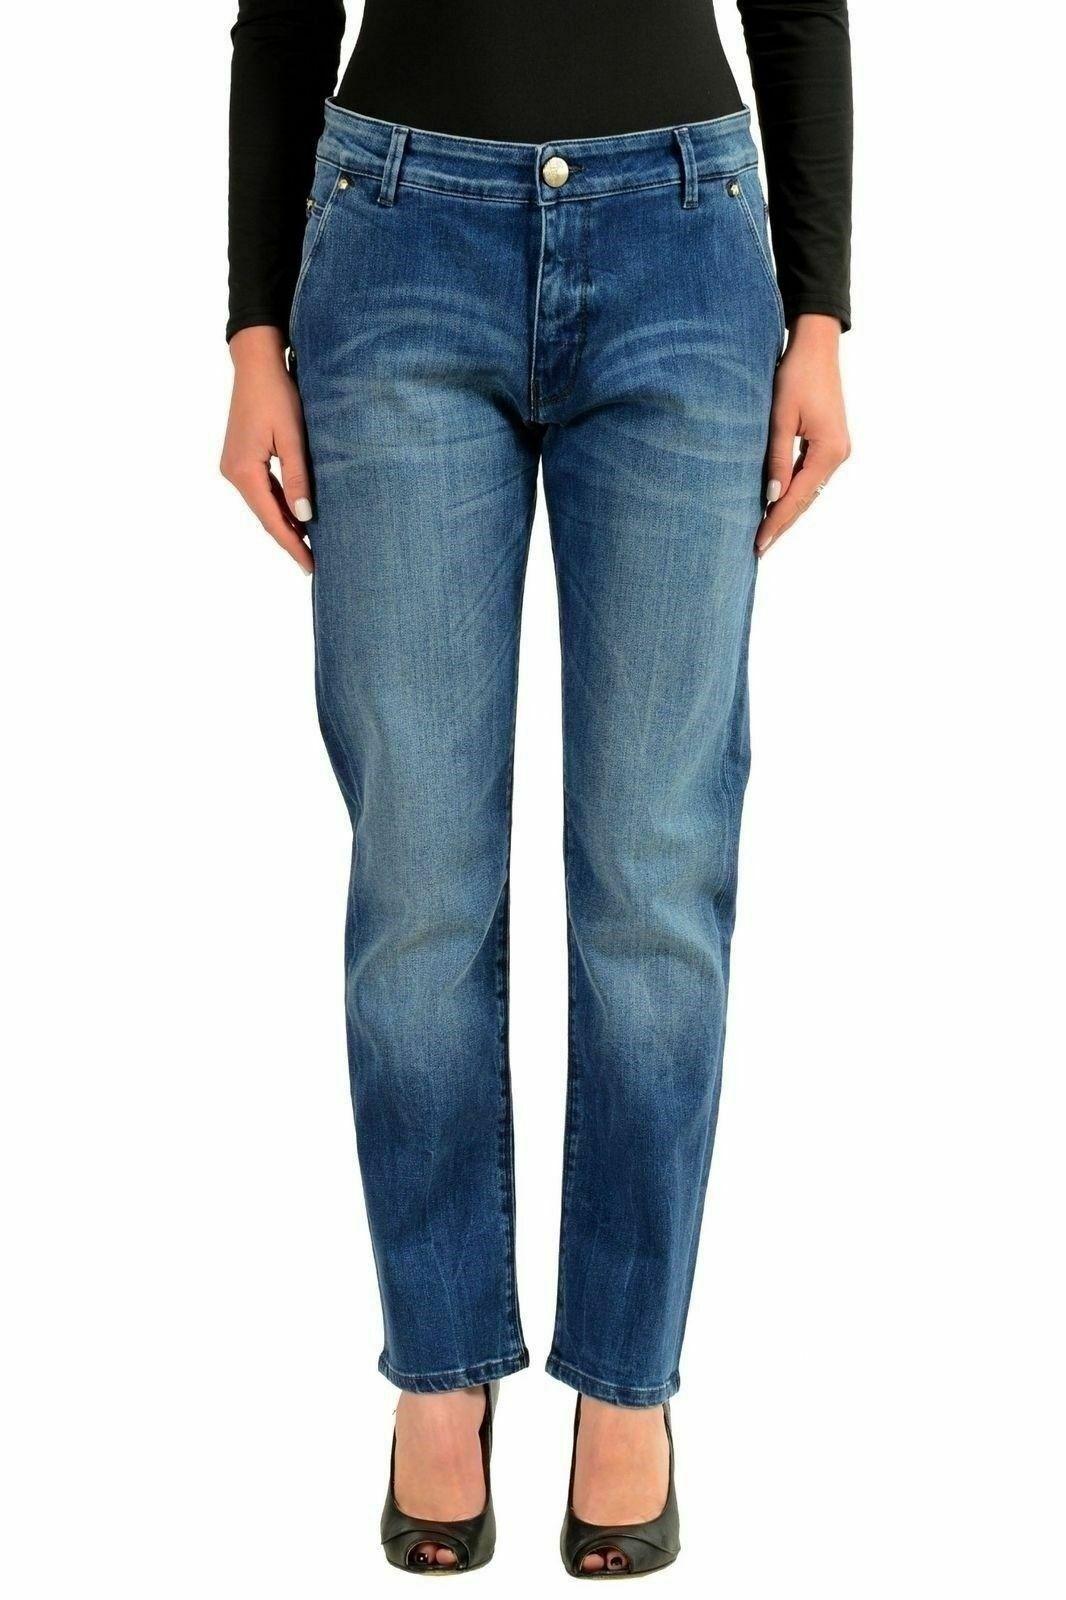 Versace Collection bluee Denim Women's Straight Leg Jeans US 4 IT 26